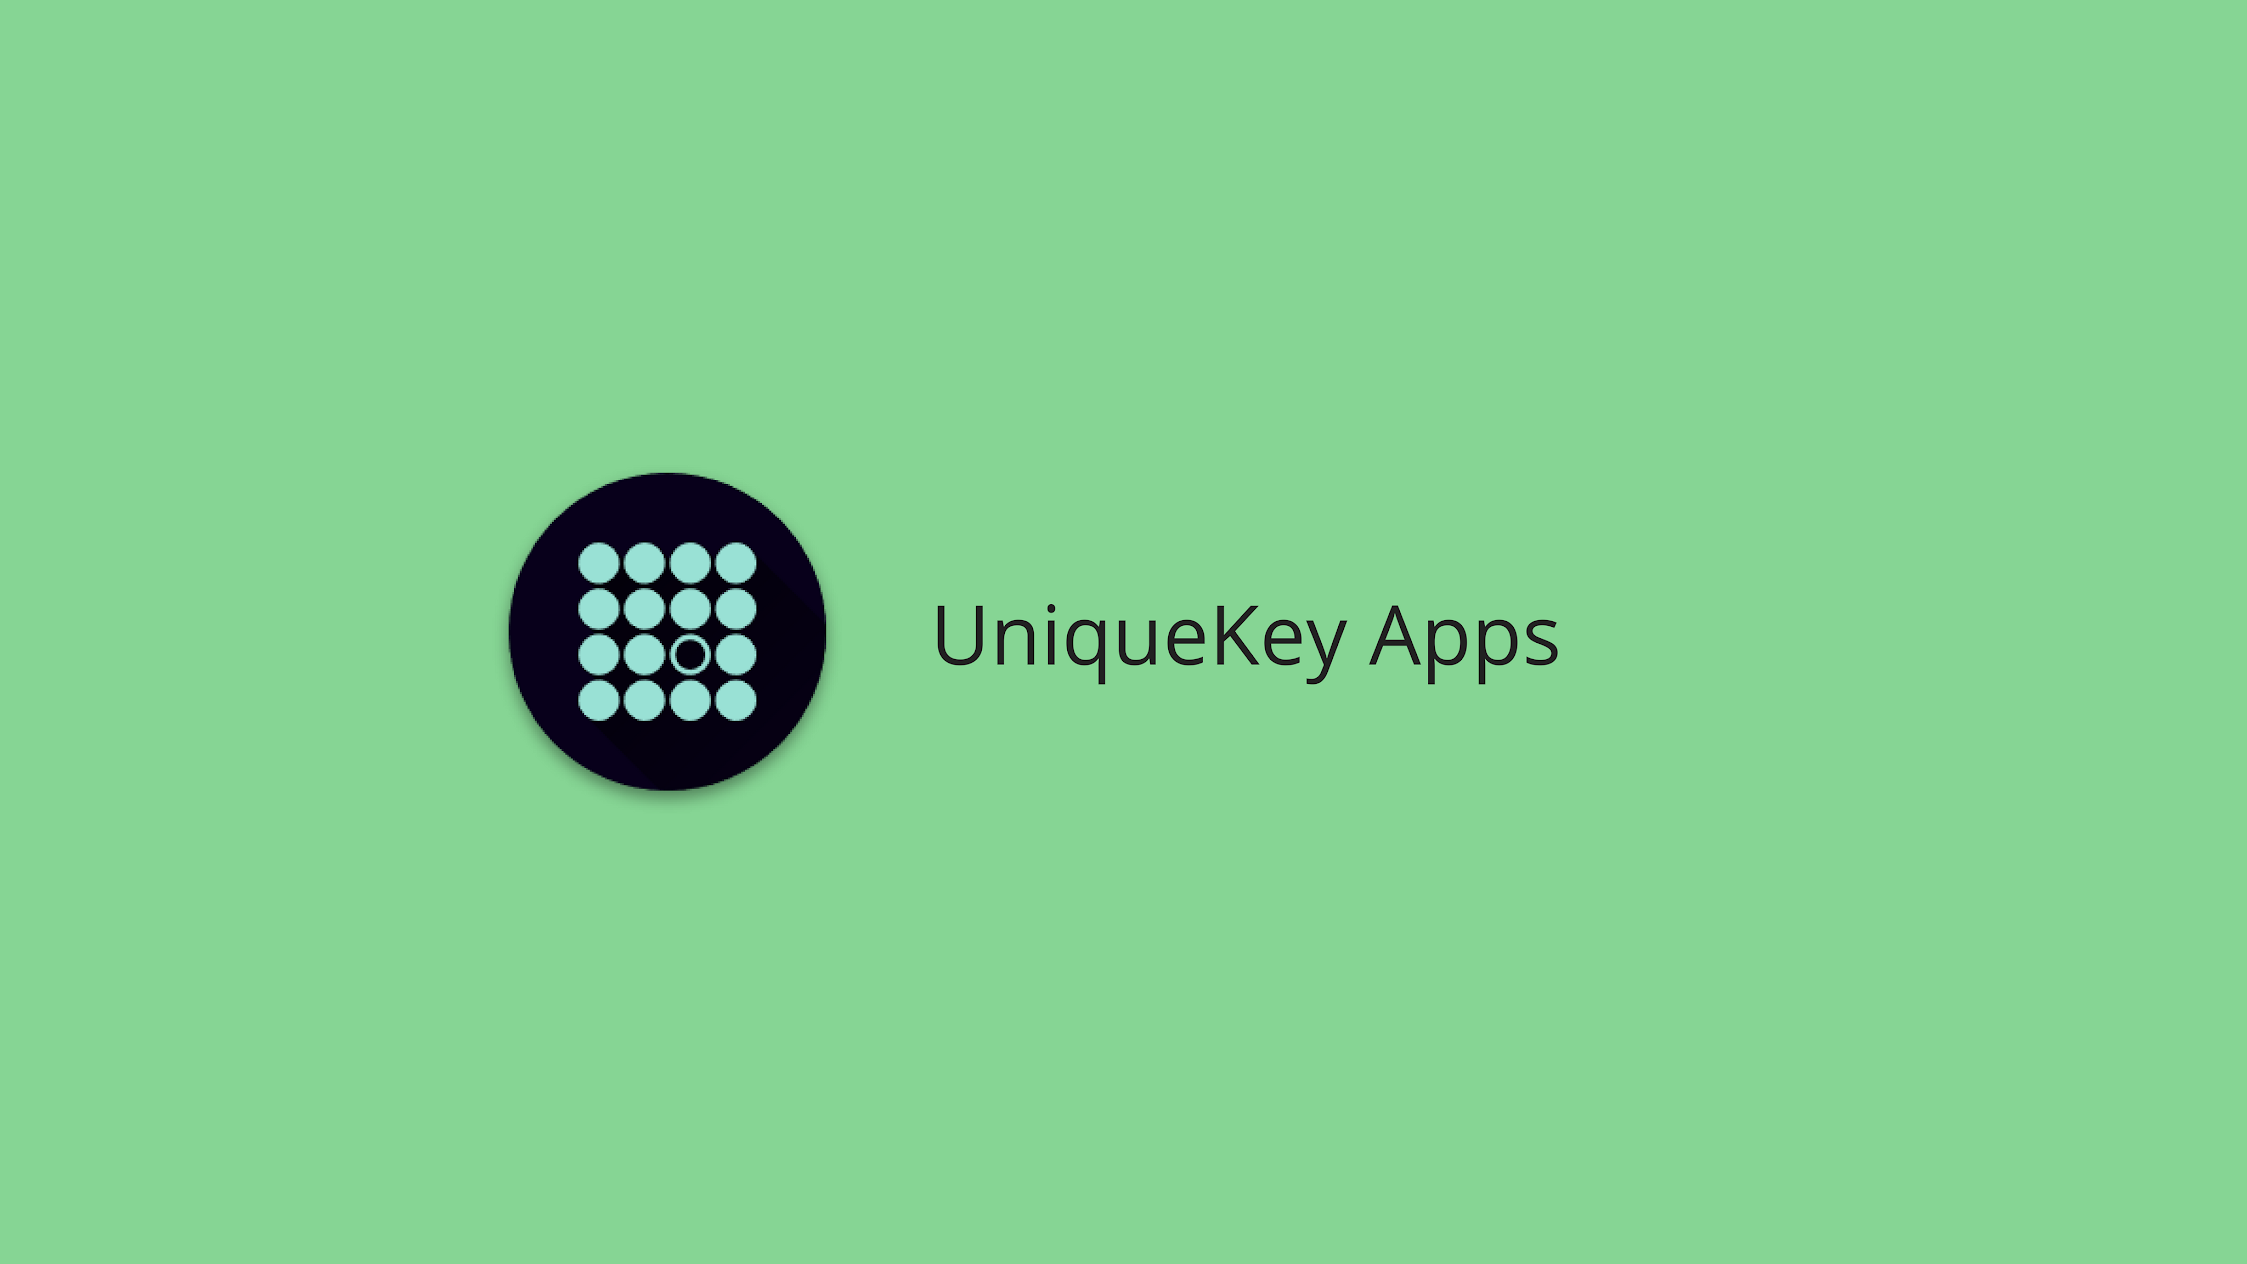 UniqueKey